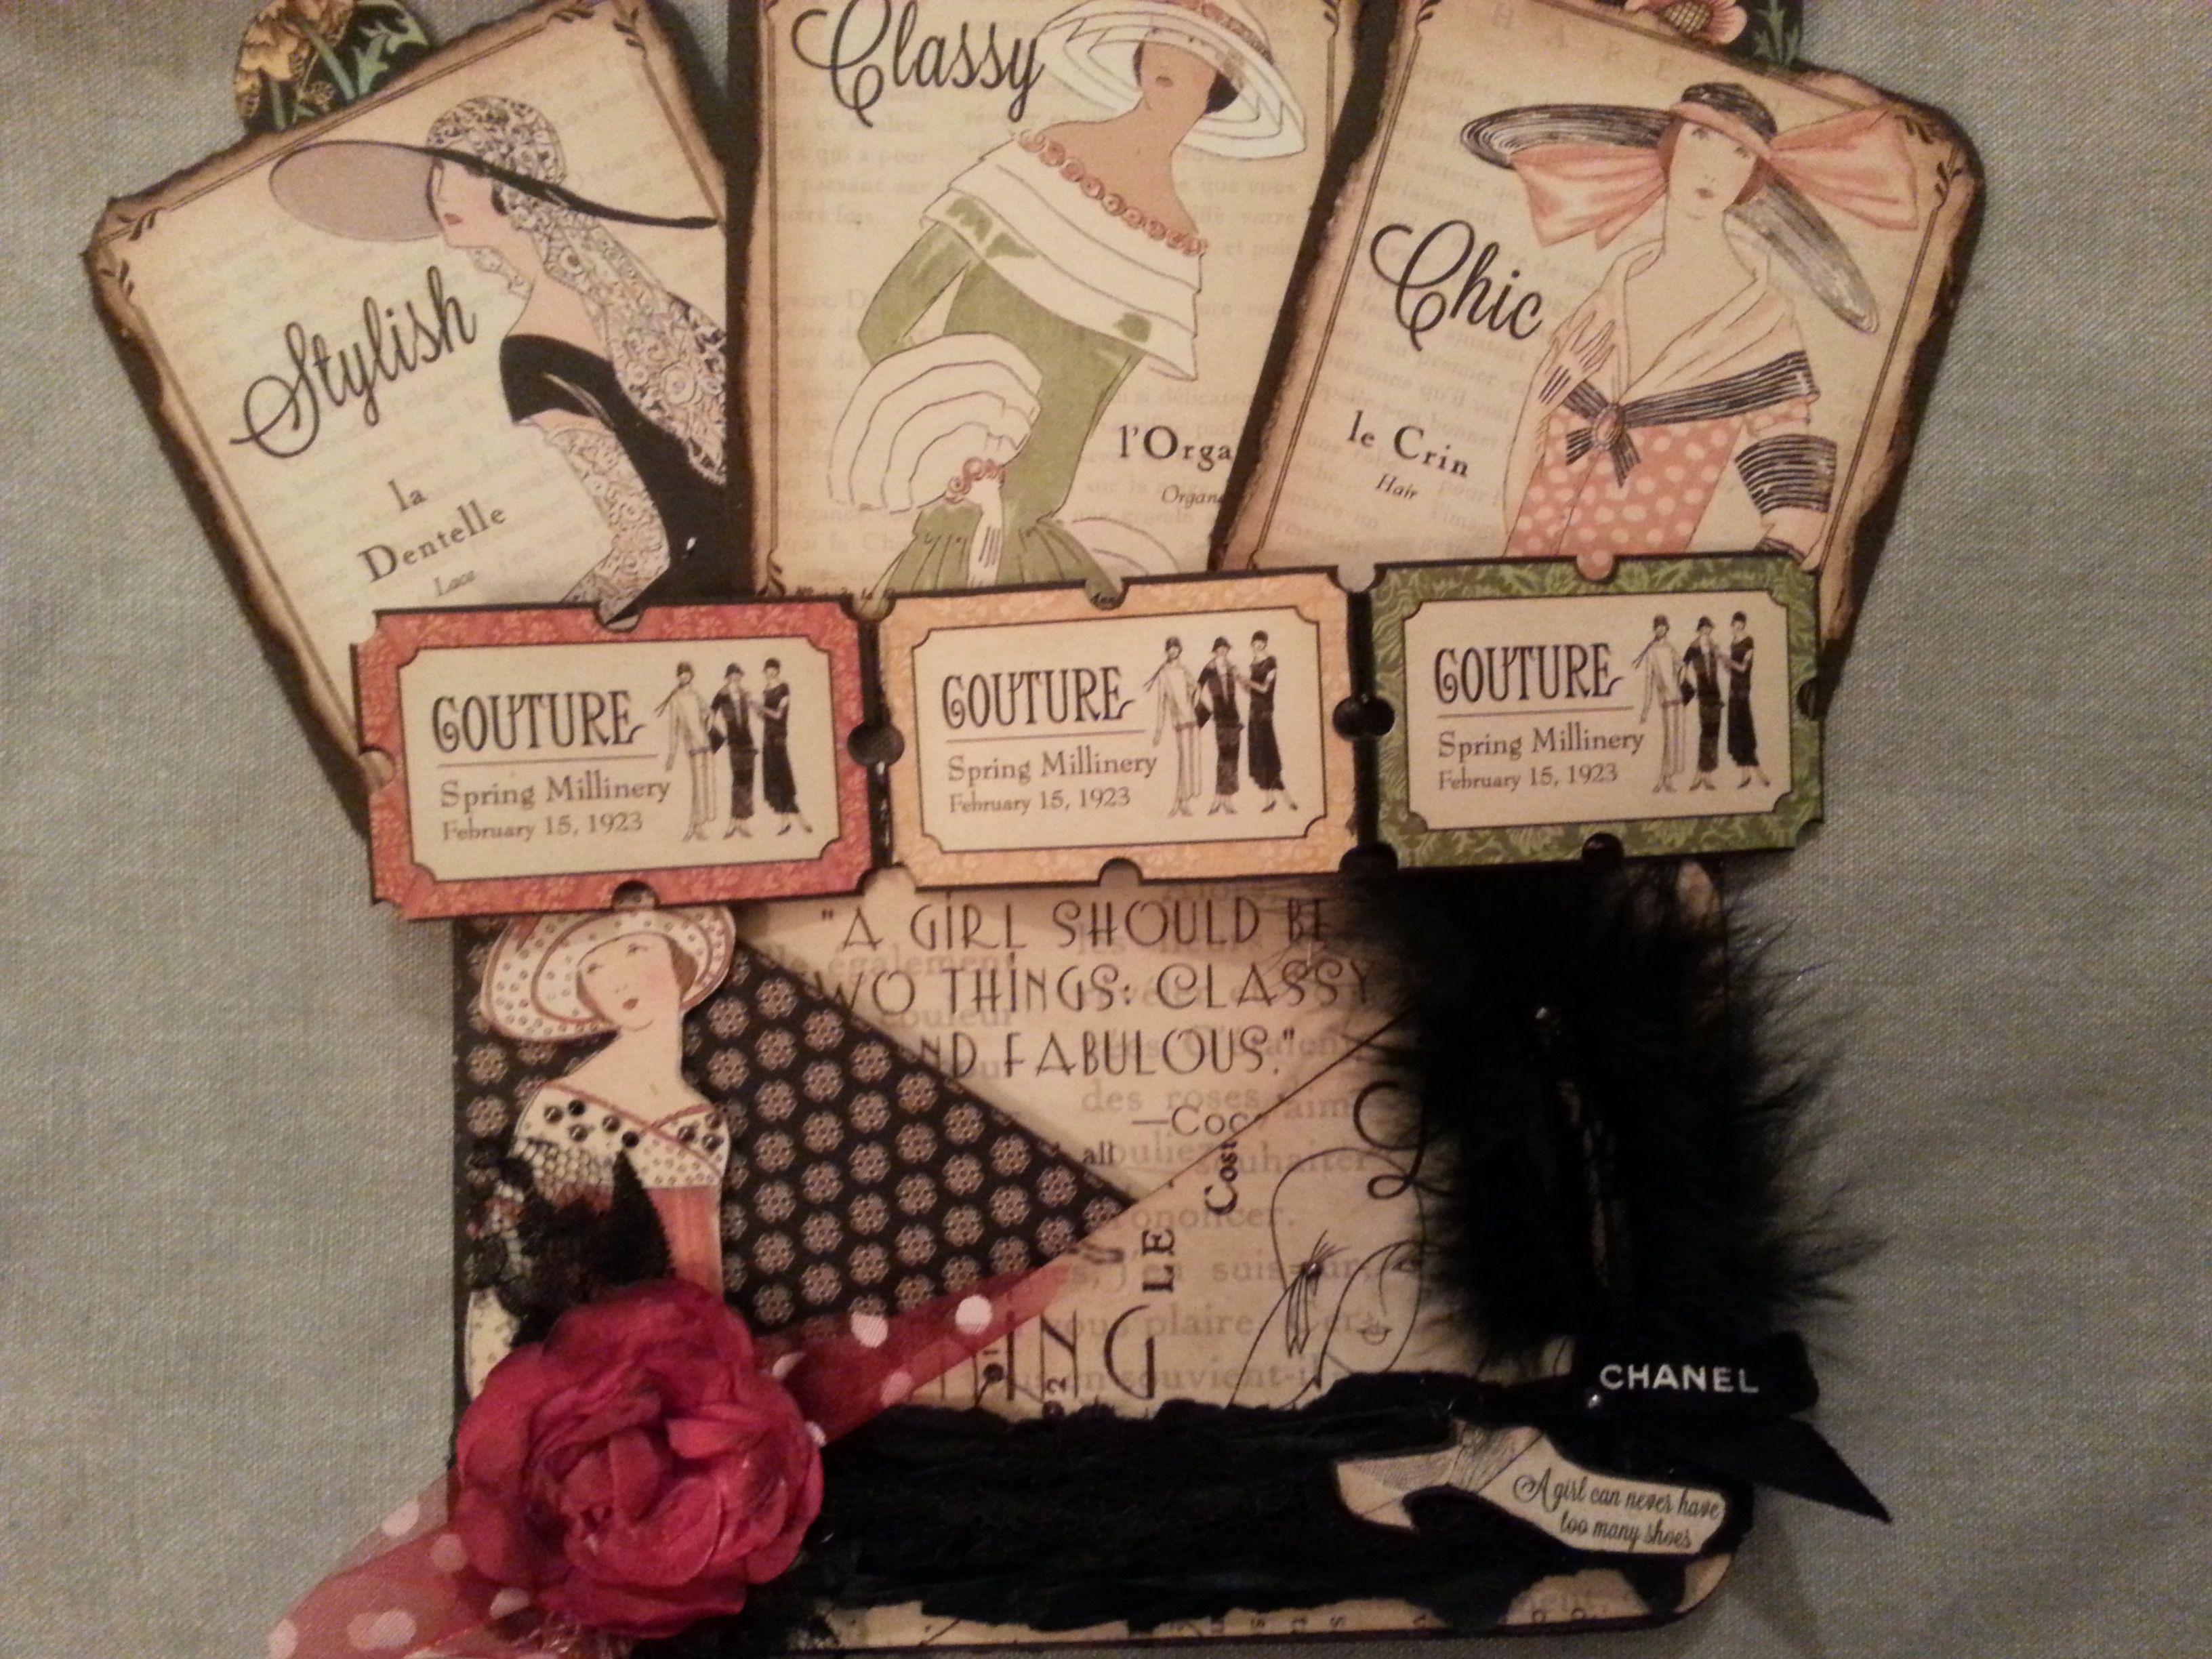 How to scrapbook wedding cards - Shabby Card Wedding Card Scrapbooking Card Diy Umschlag Und Karte Zum Geburtstag